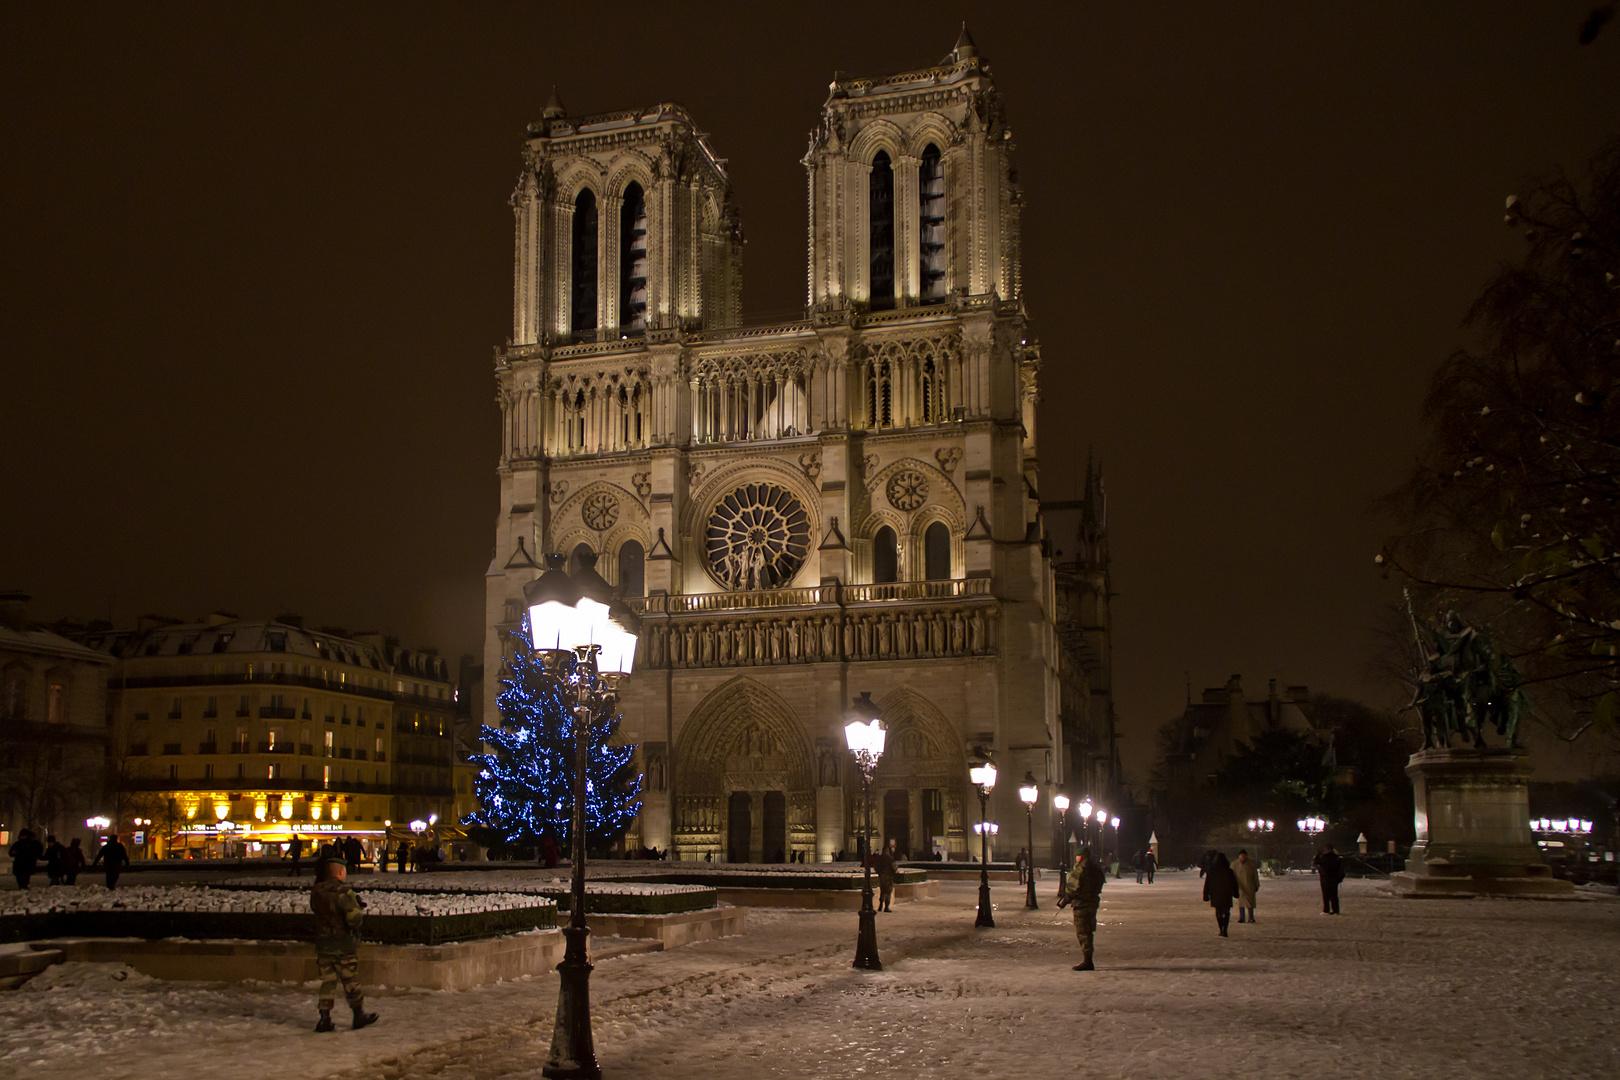 Notre Dame bewacht